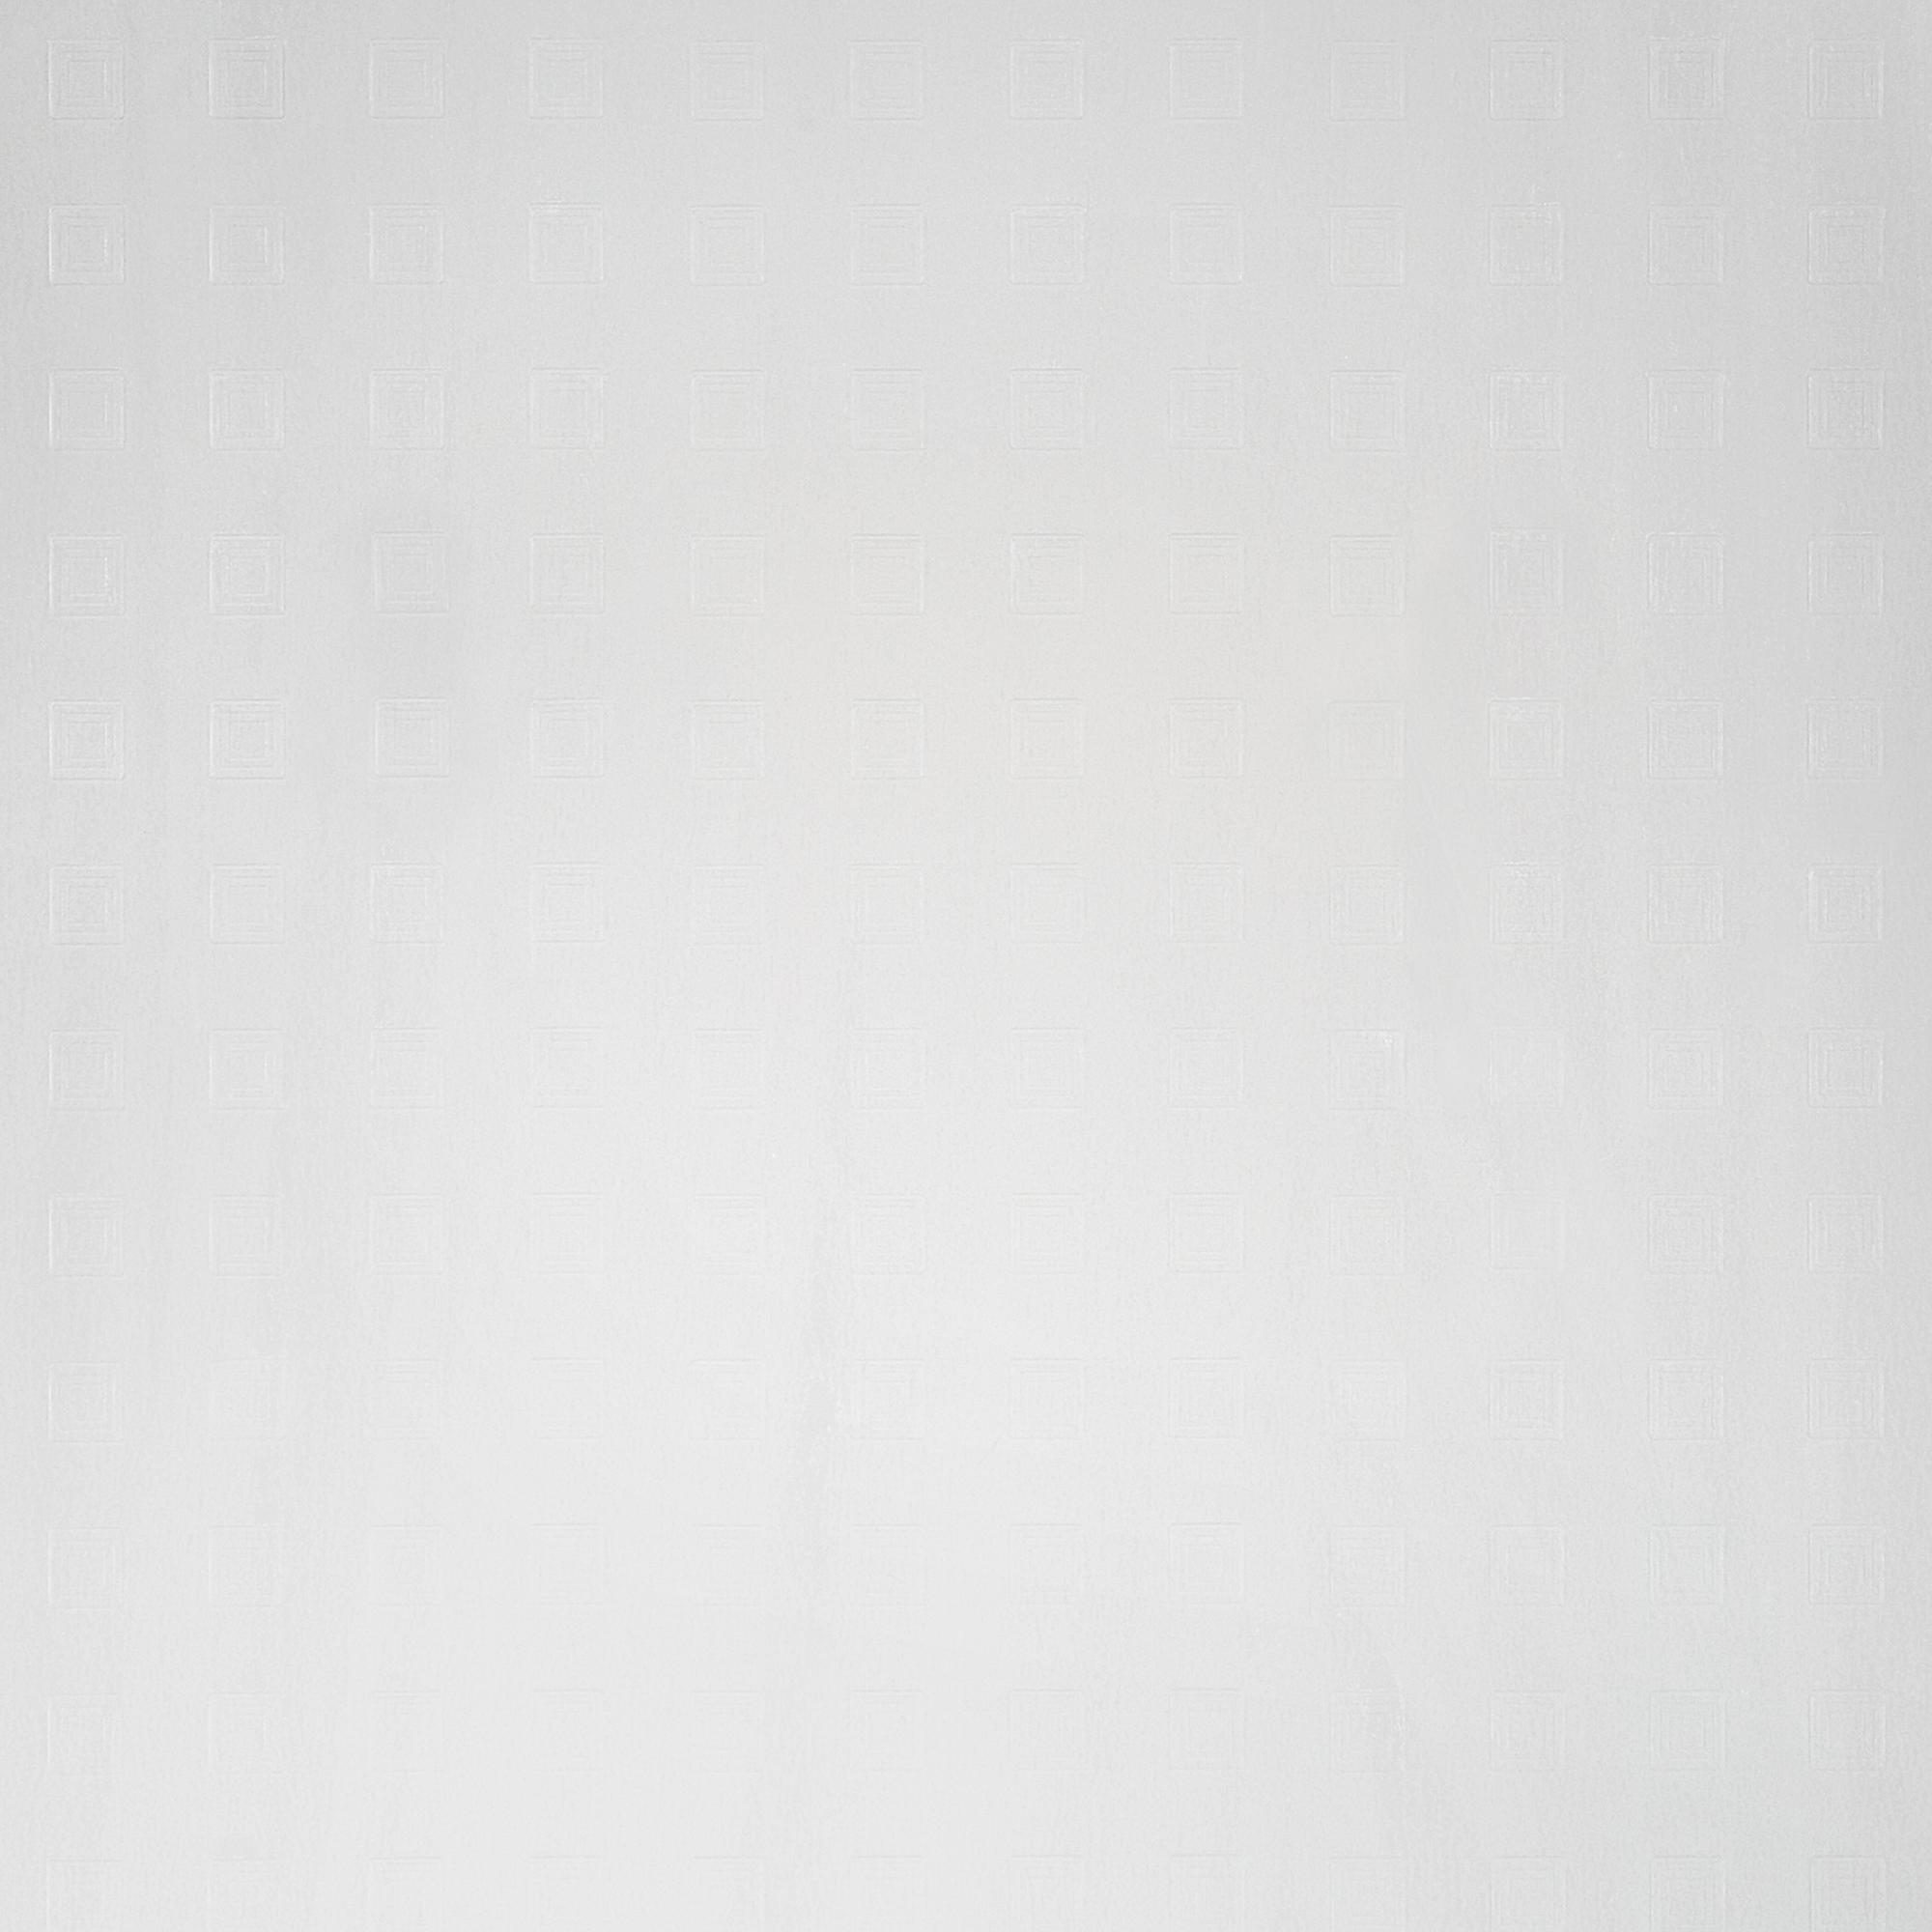 Klebefolie Holzdekor Möbelfolie Holz Kiefer 90cmx200cm selbstklebende Dekorfolie